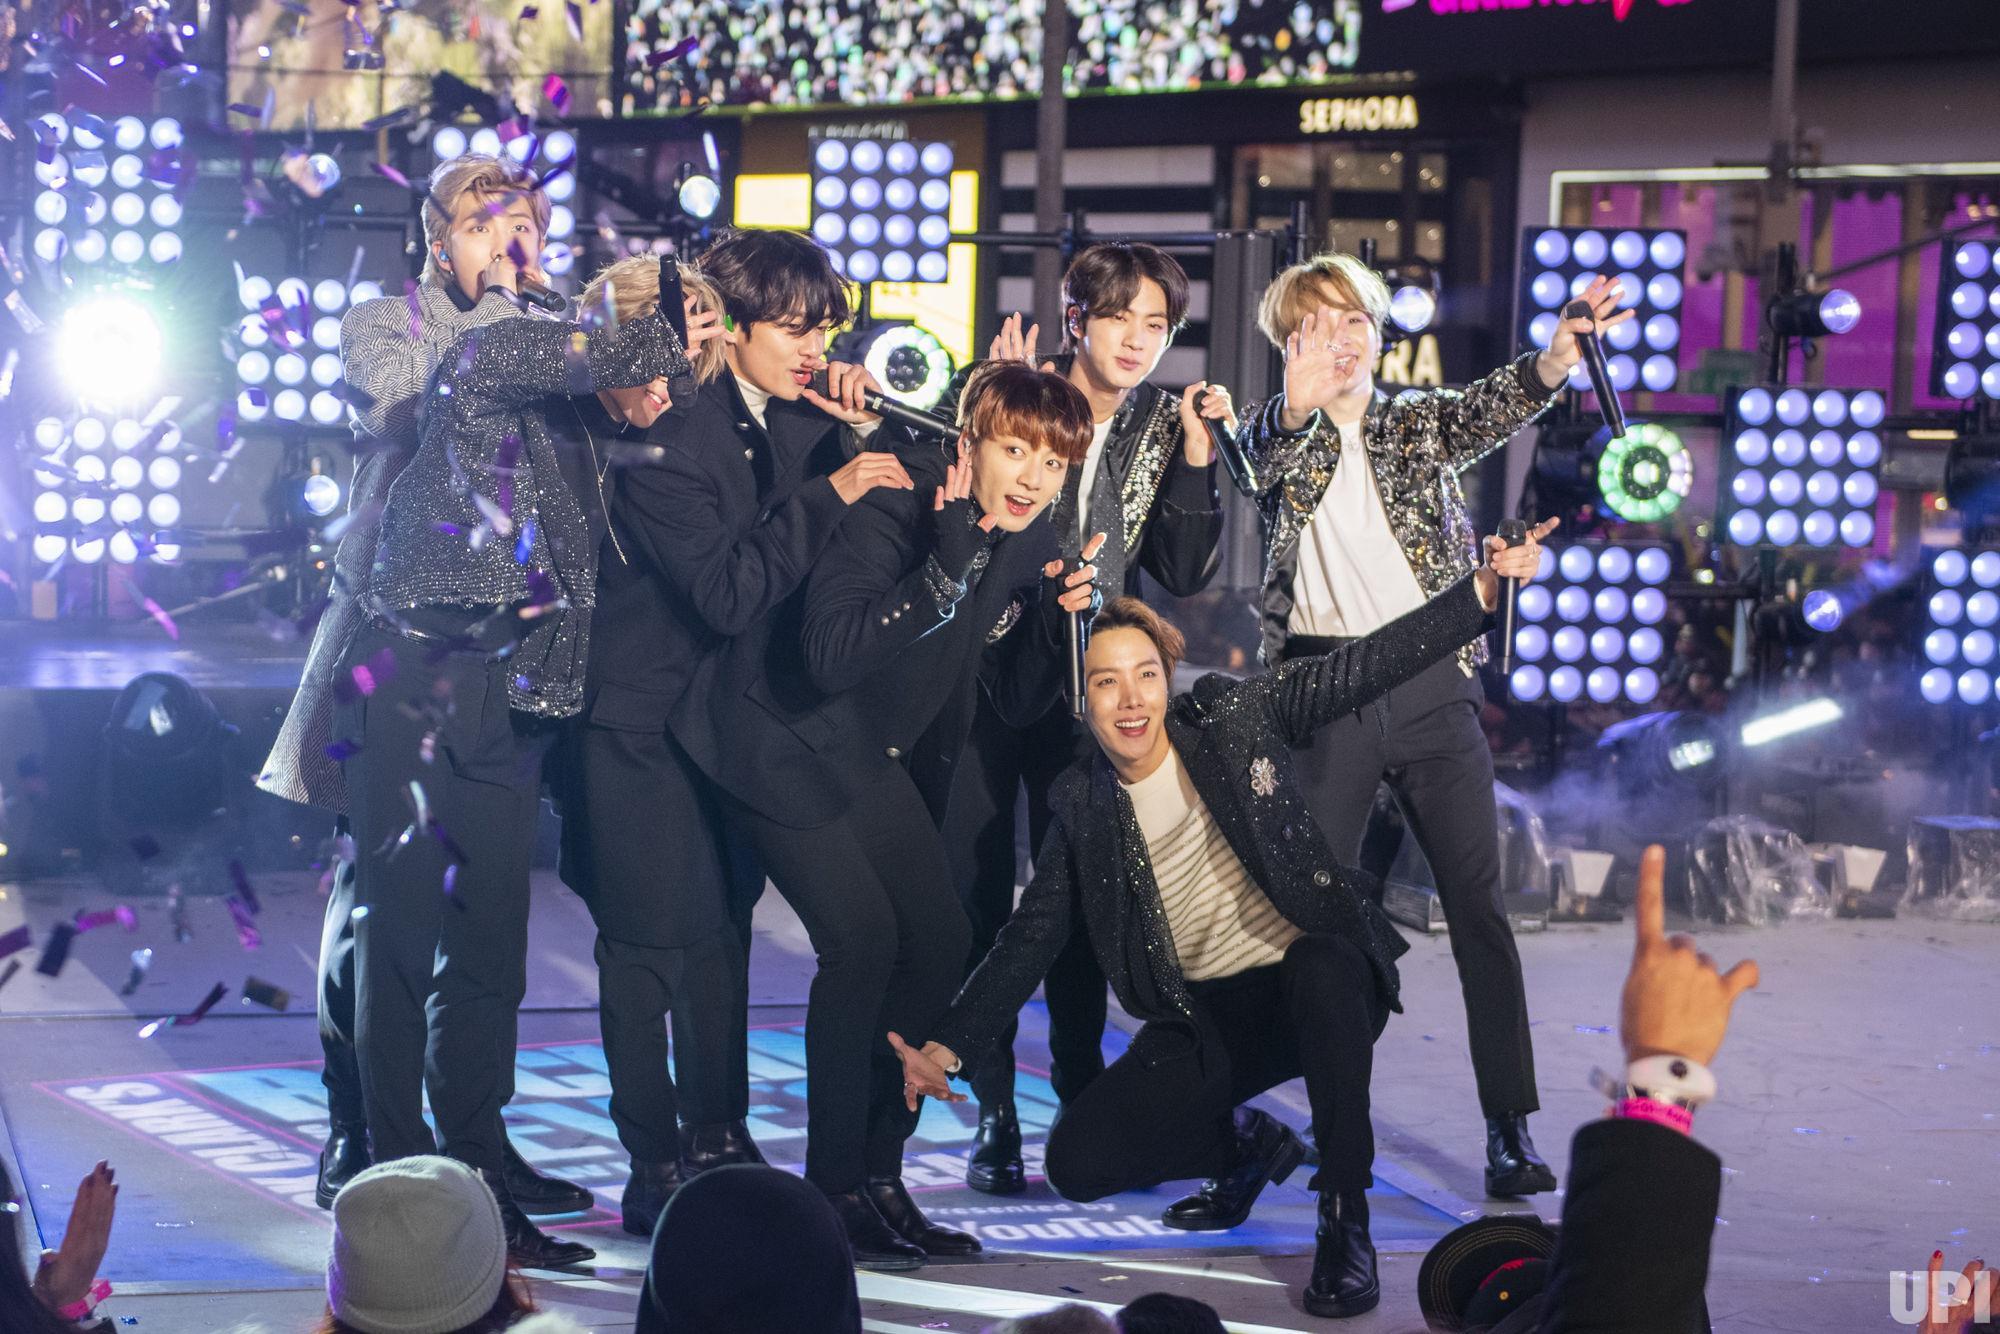 Penampilan BTS di New Year's Rockin' Eve 2020 Mendapatkan Rating Tertinggi